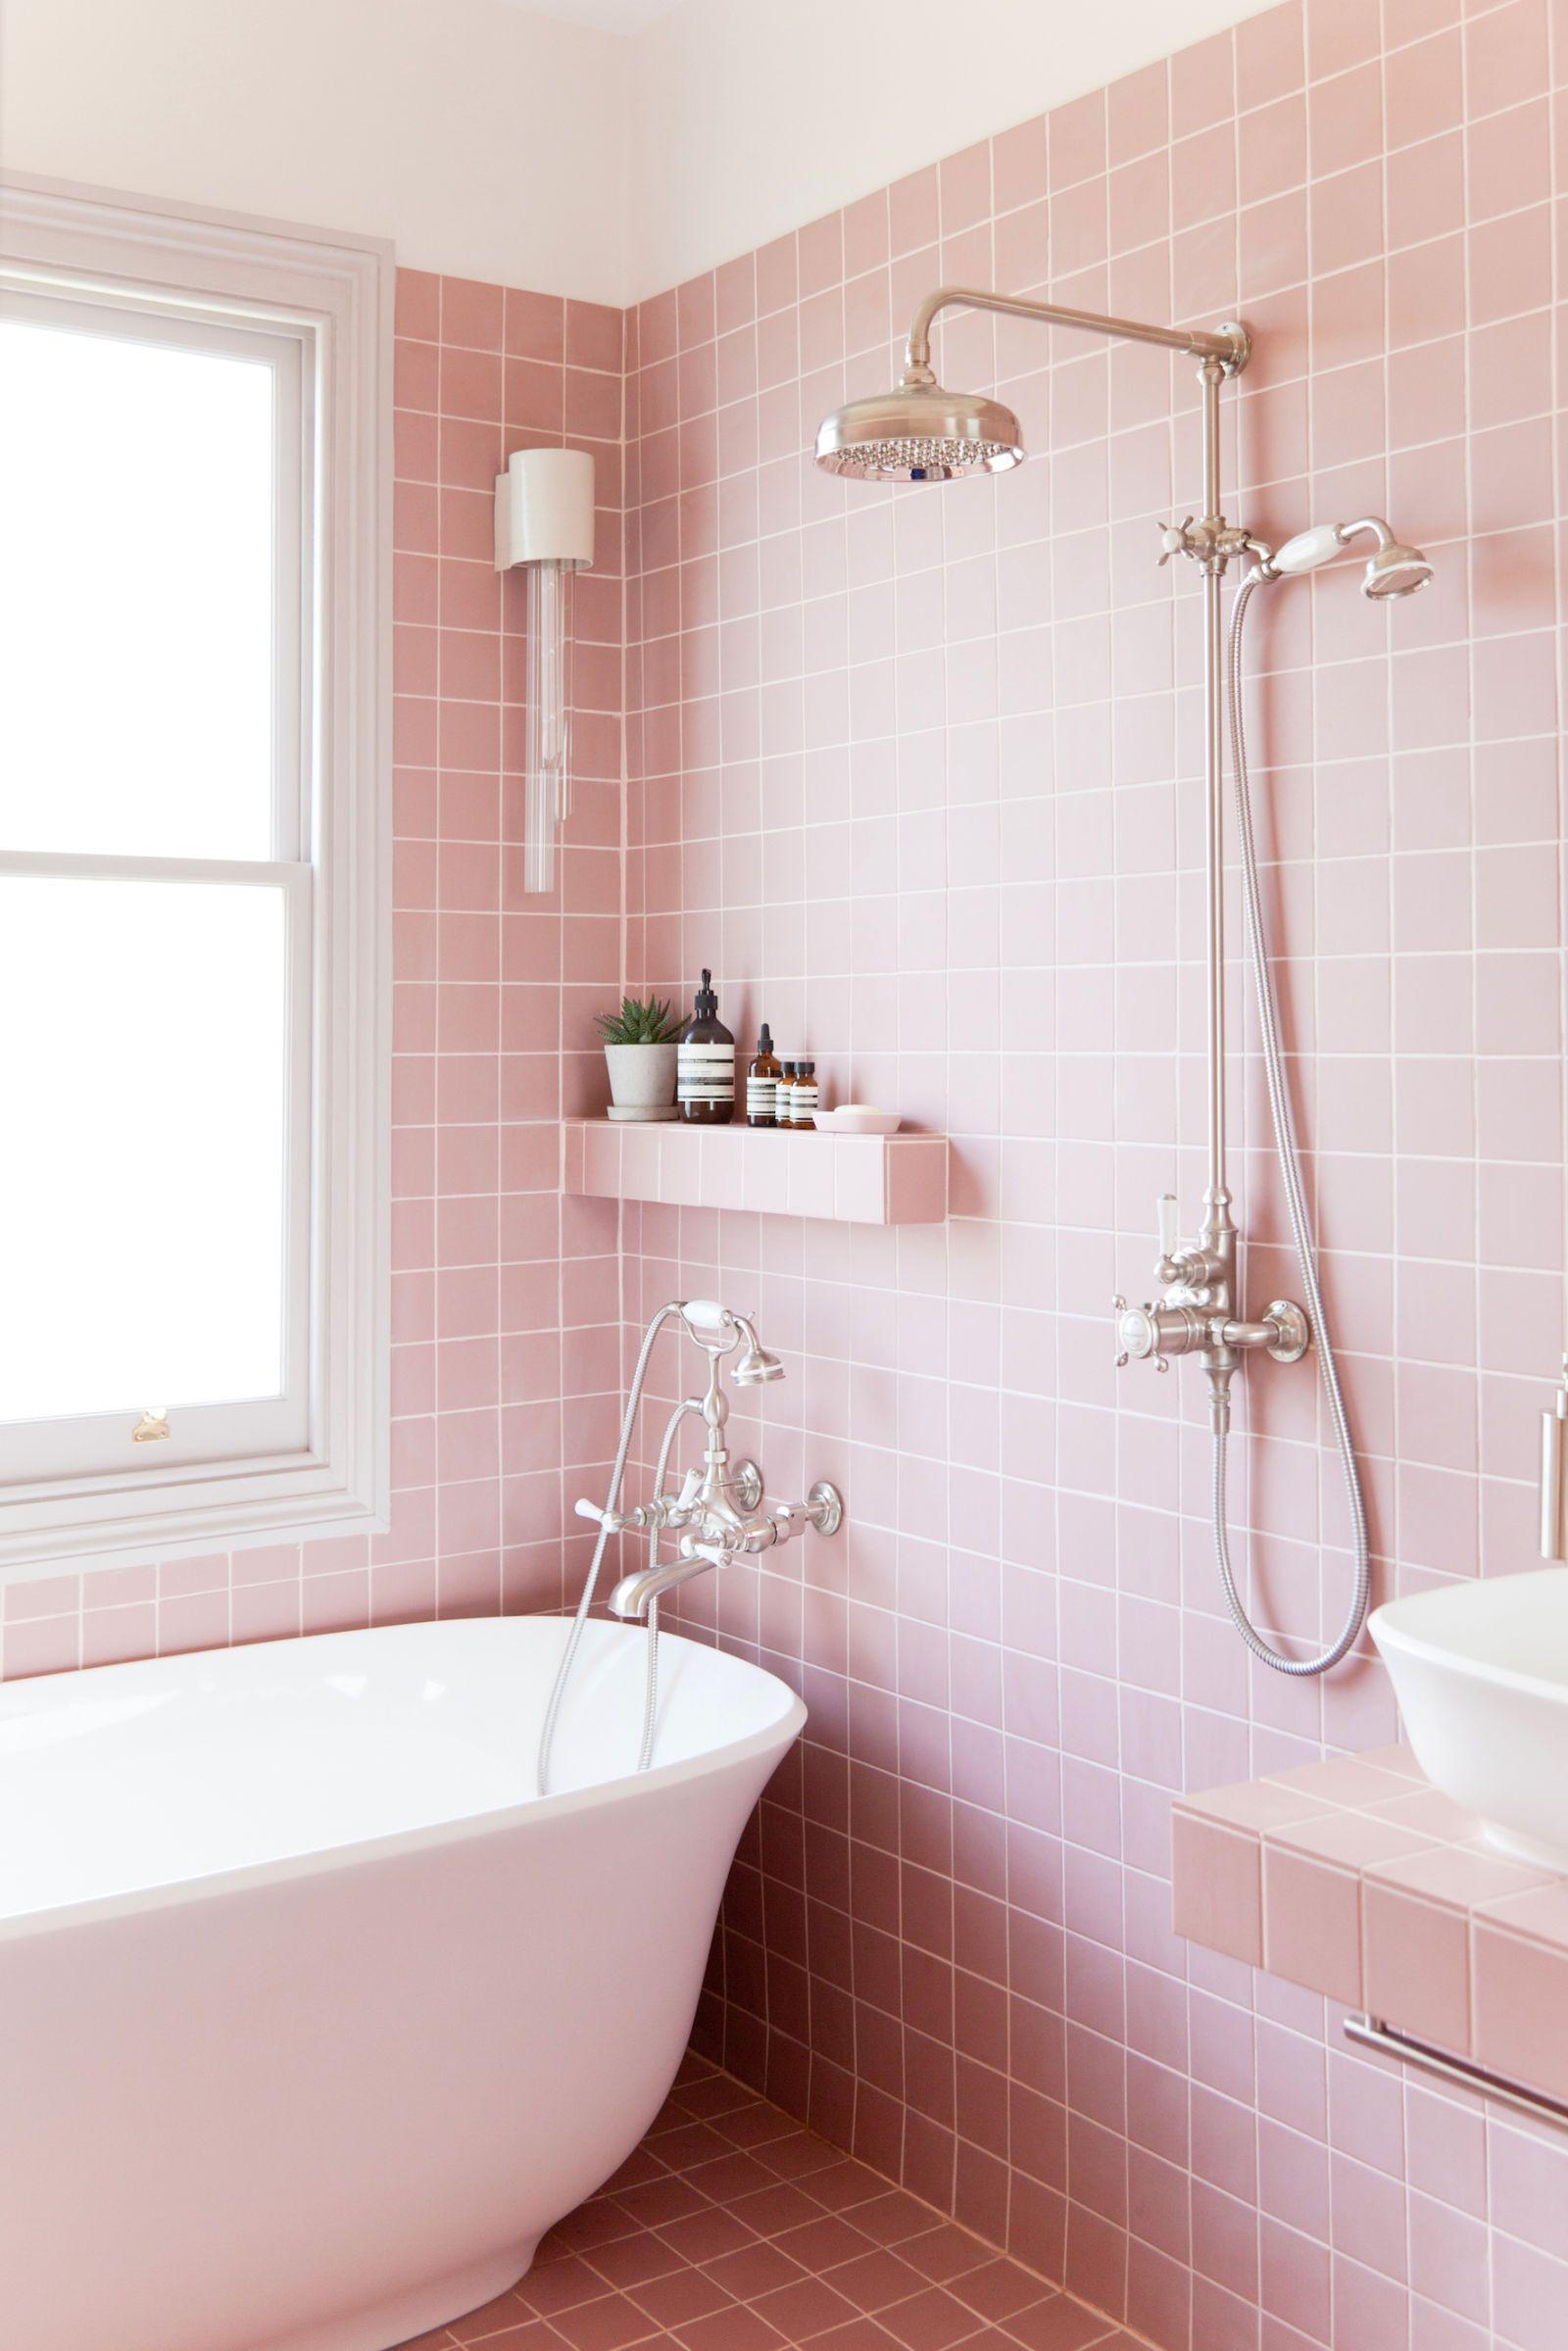 Attirant 2LG Studio   Pink Bathroom Look: Tile Giant Victorian Pink ...